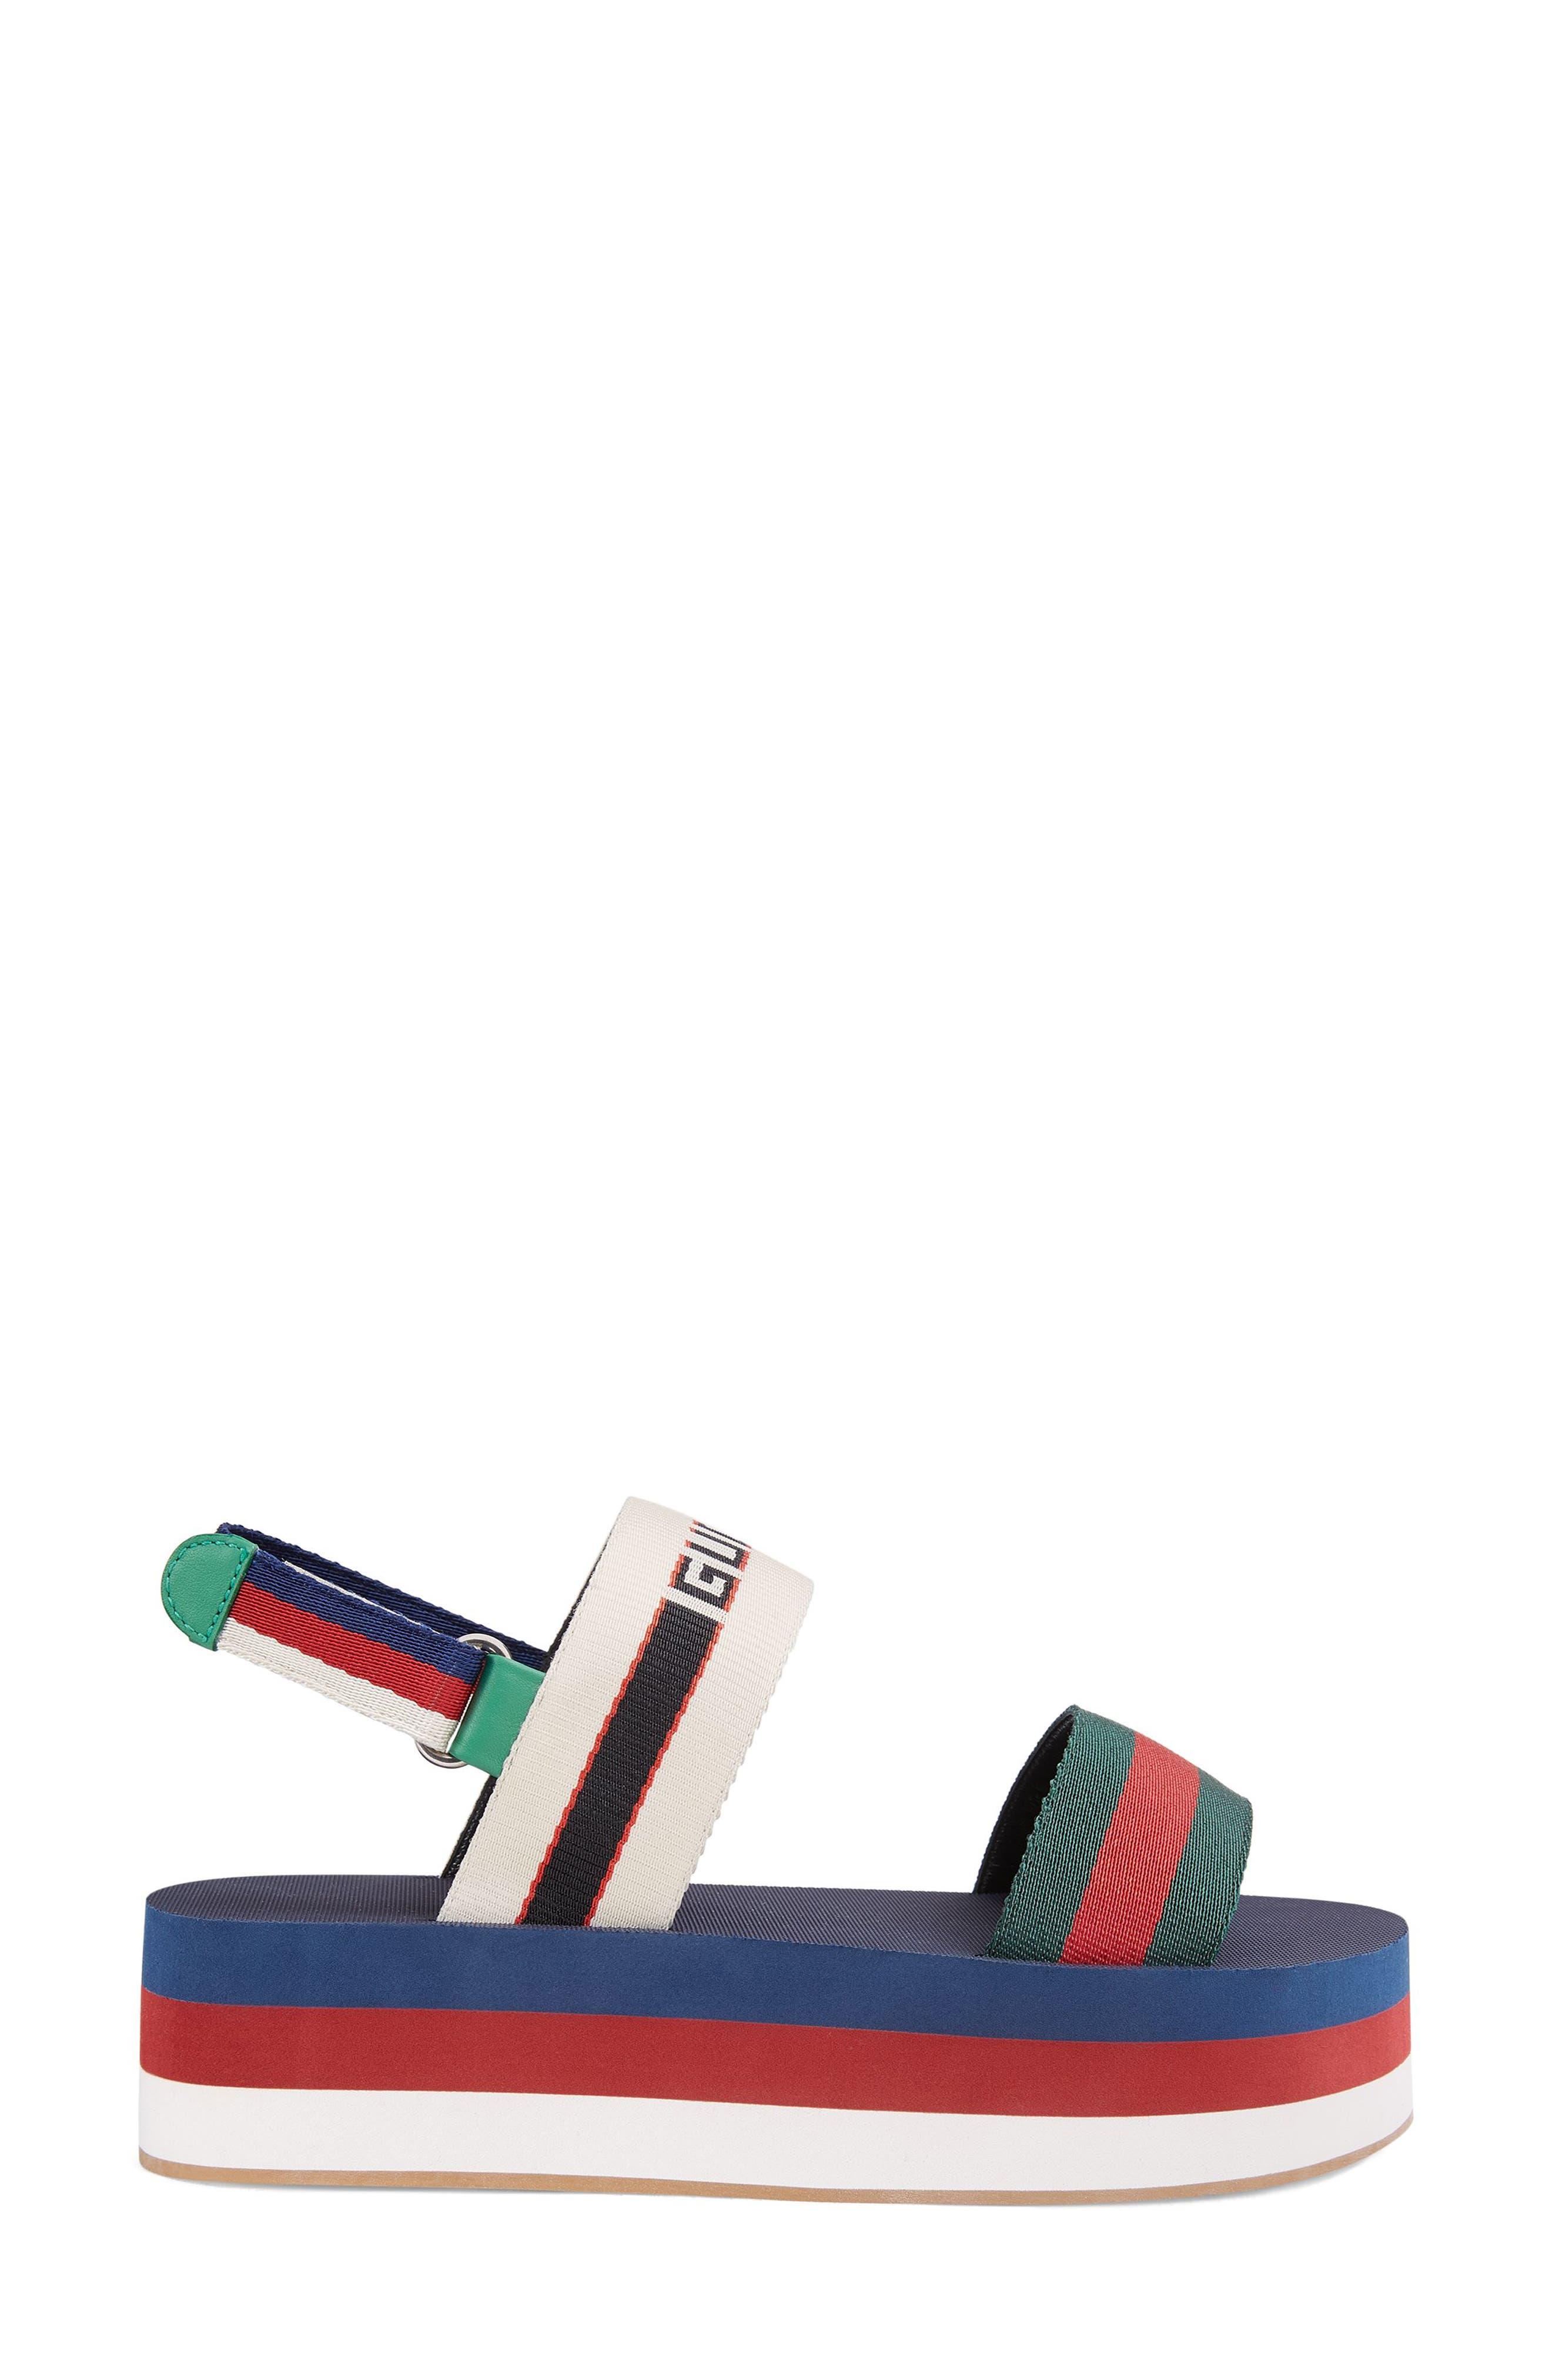 Slingback Flatform Sandal,                             Alternate thumbnail 2, color,                             Blue/ Red